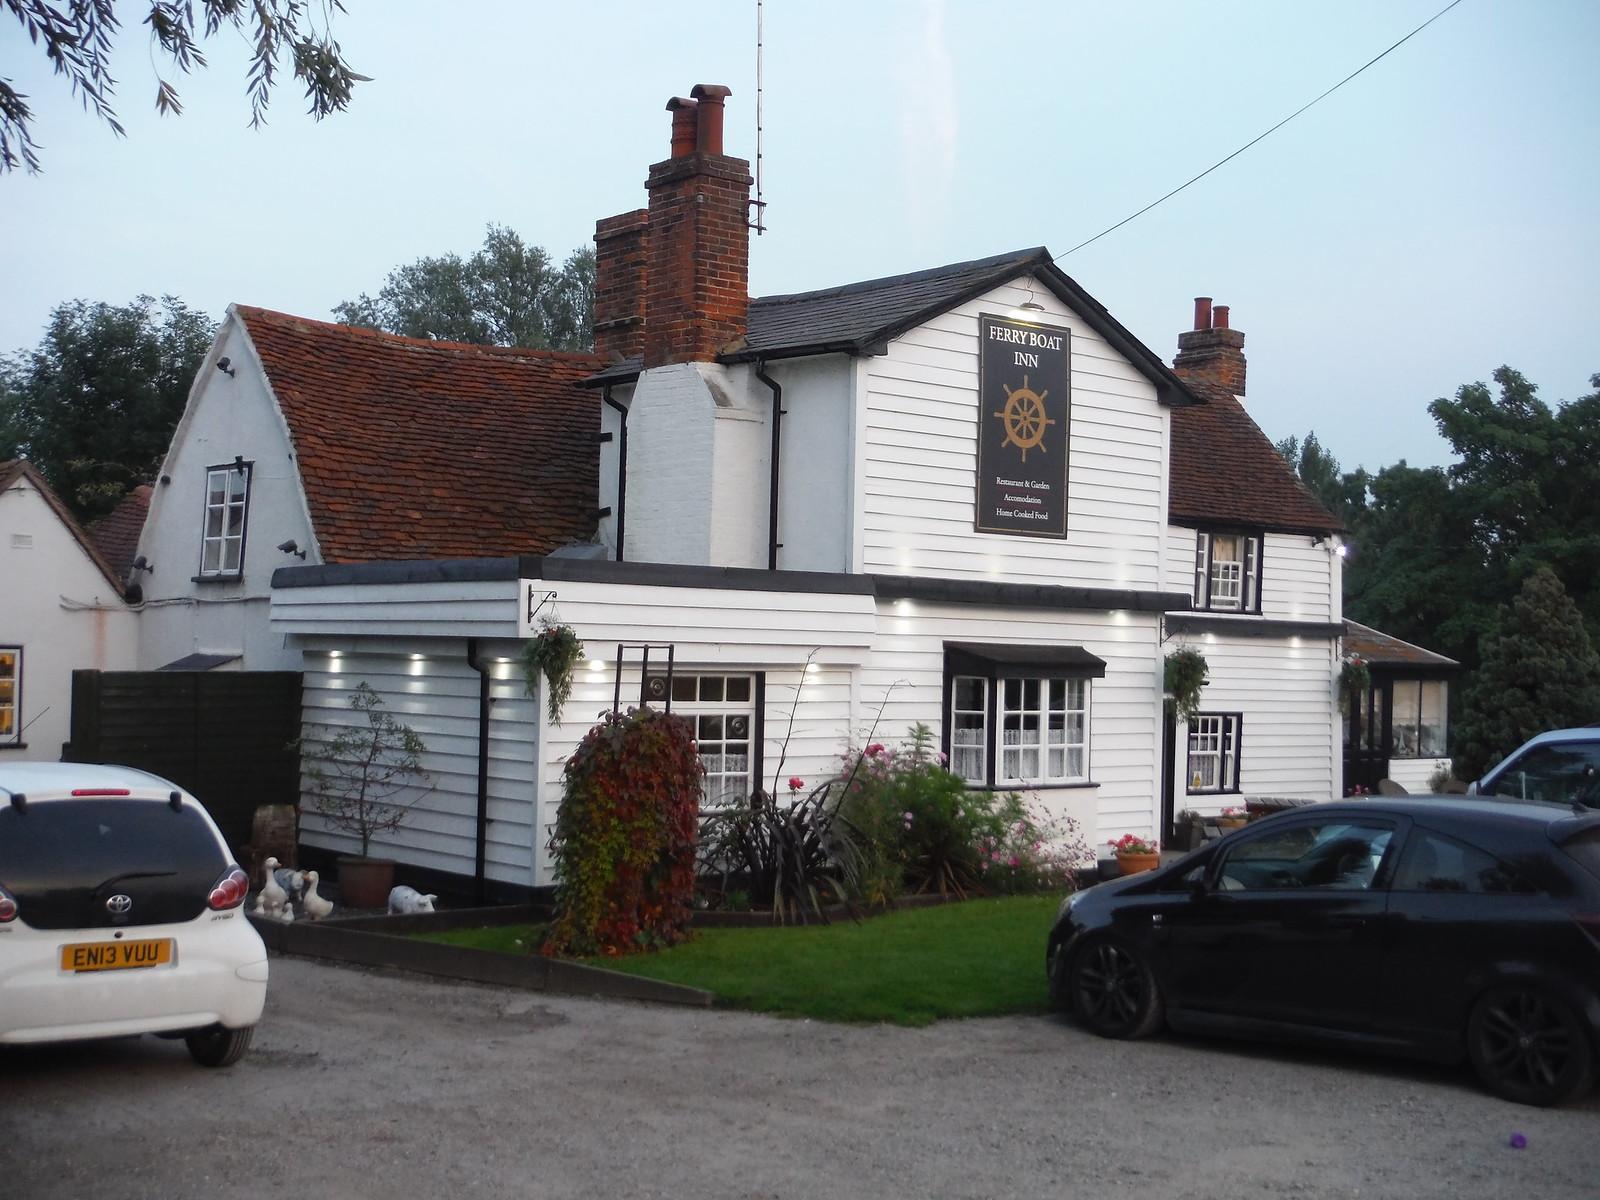 Ferry Boat Inn, North Fambridge SWC Walk 159 South Woodham Ferrers to North Fambridge